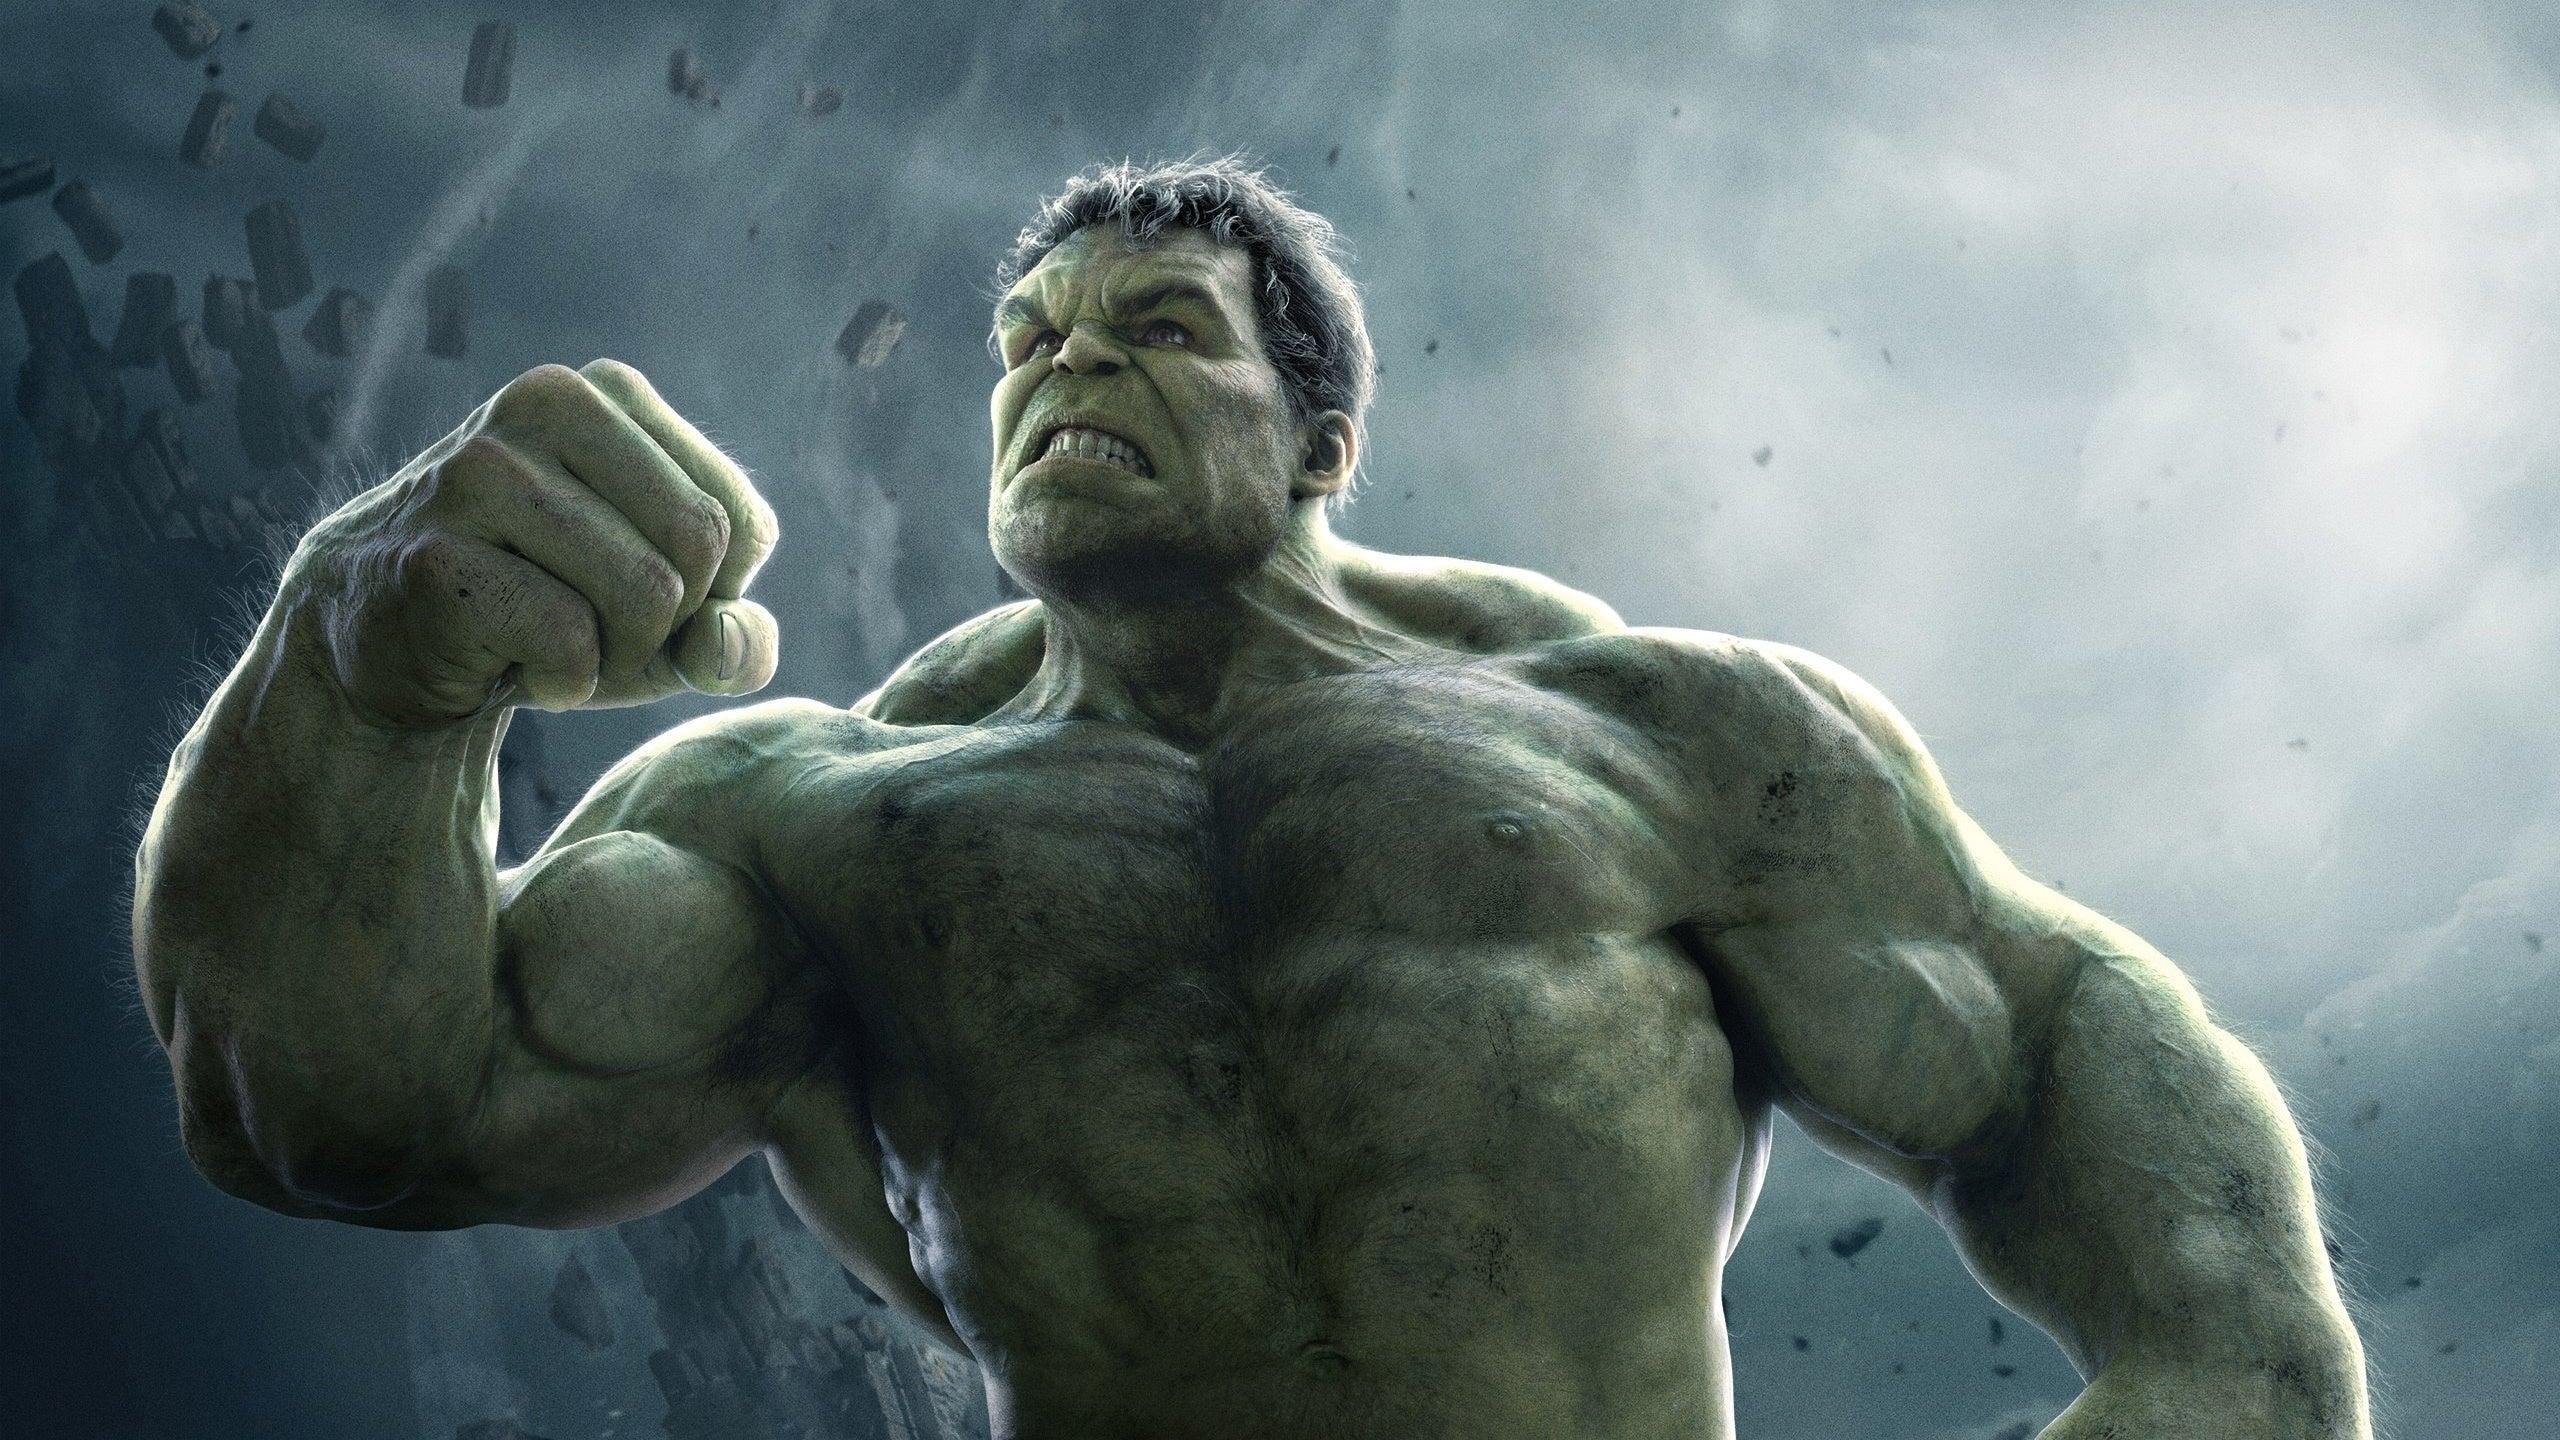 Hulk 4k Wallpapers For Your Desktop Or Mobile Screen Free